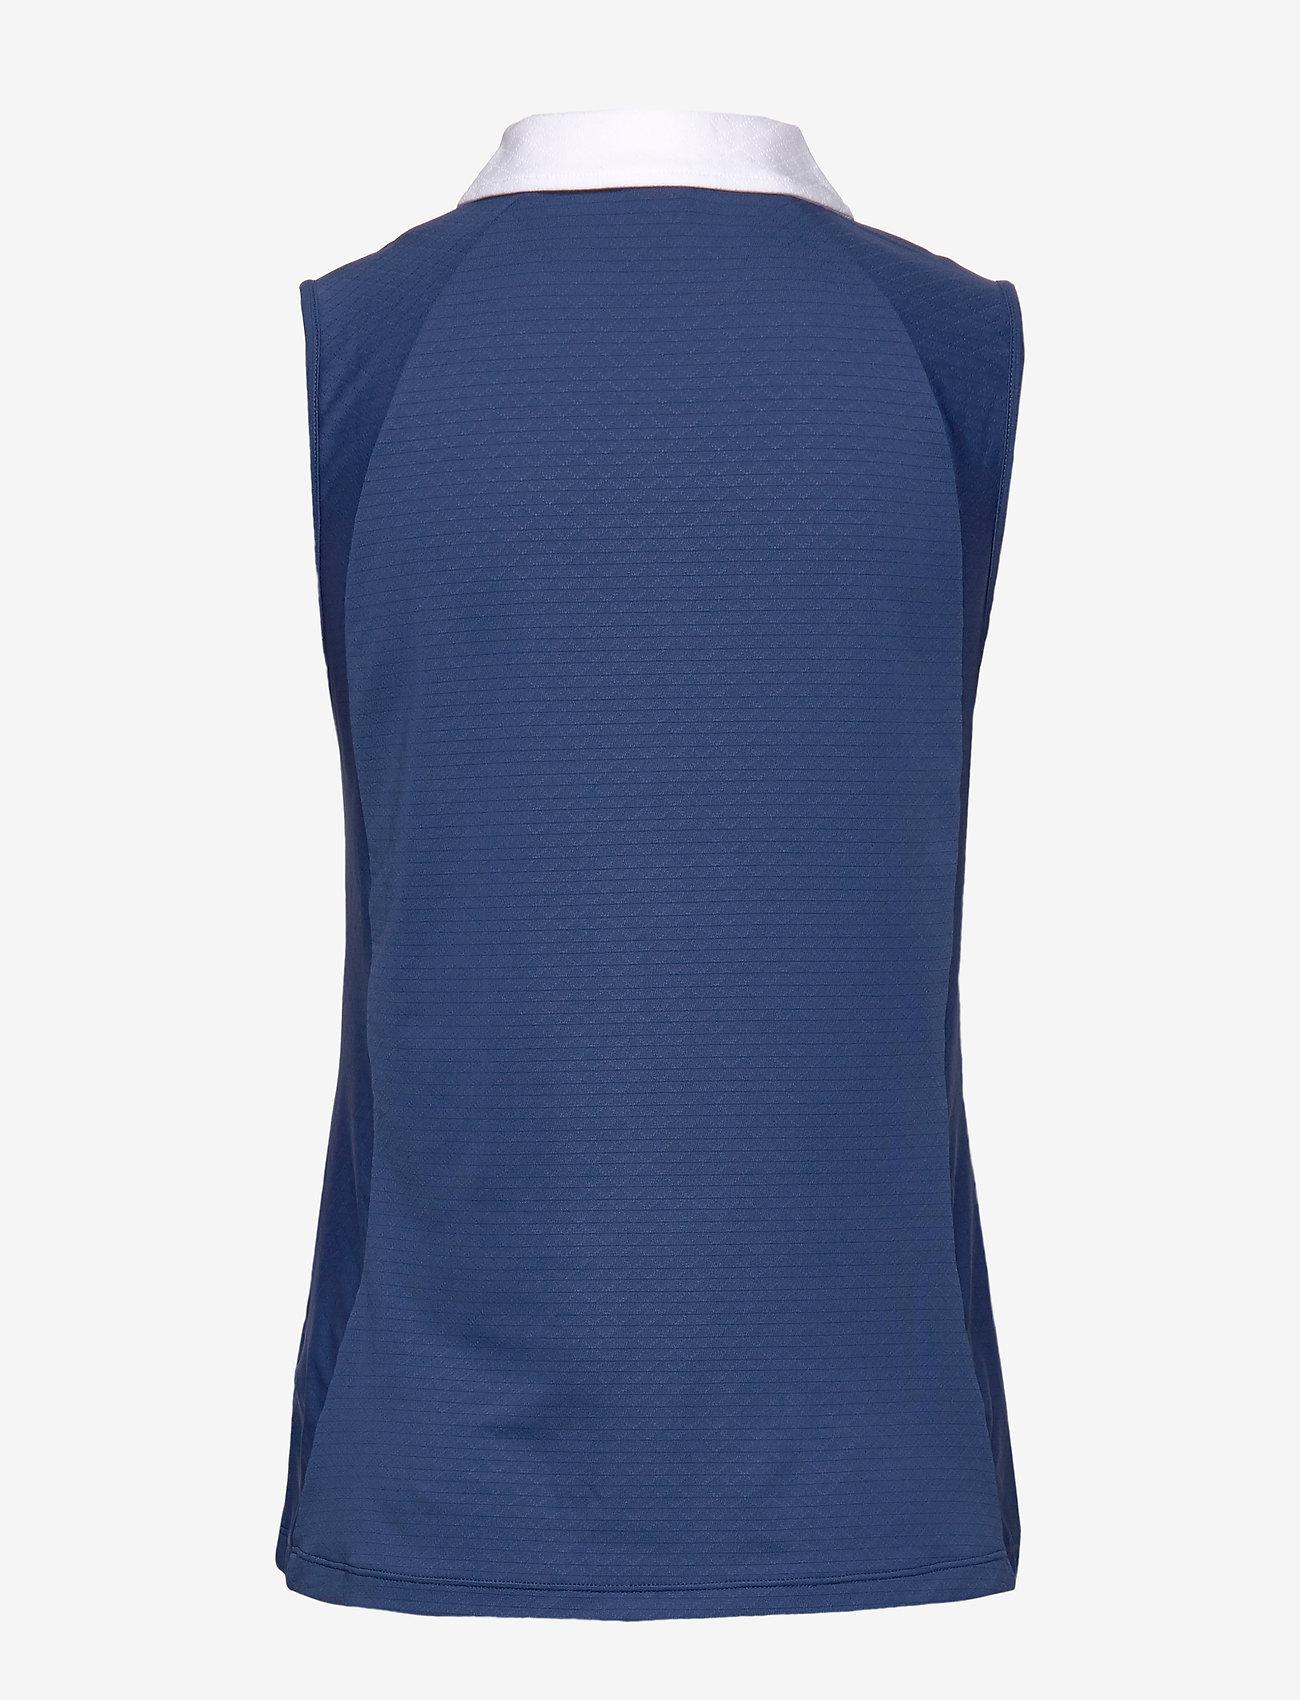 Daily Sports Carrol Sl Polo Shirt - T-shirts & Tops